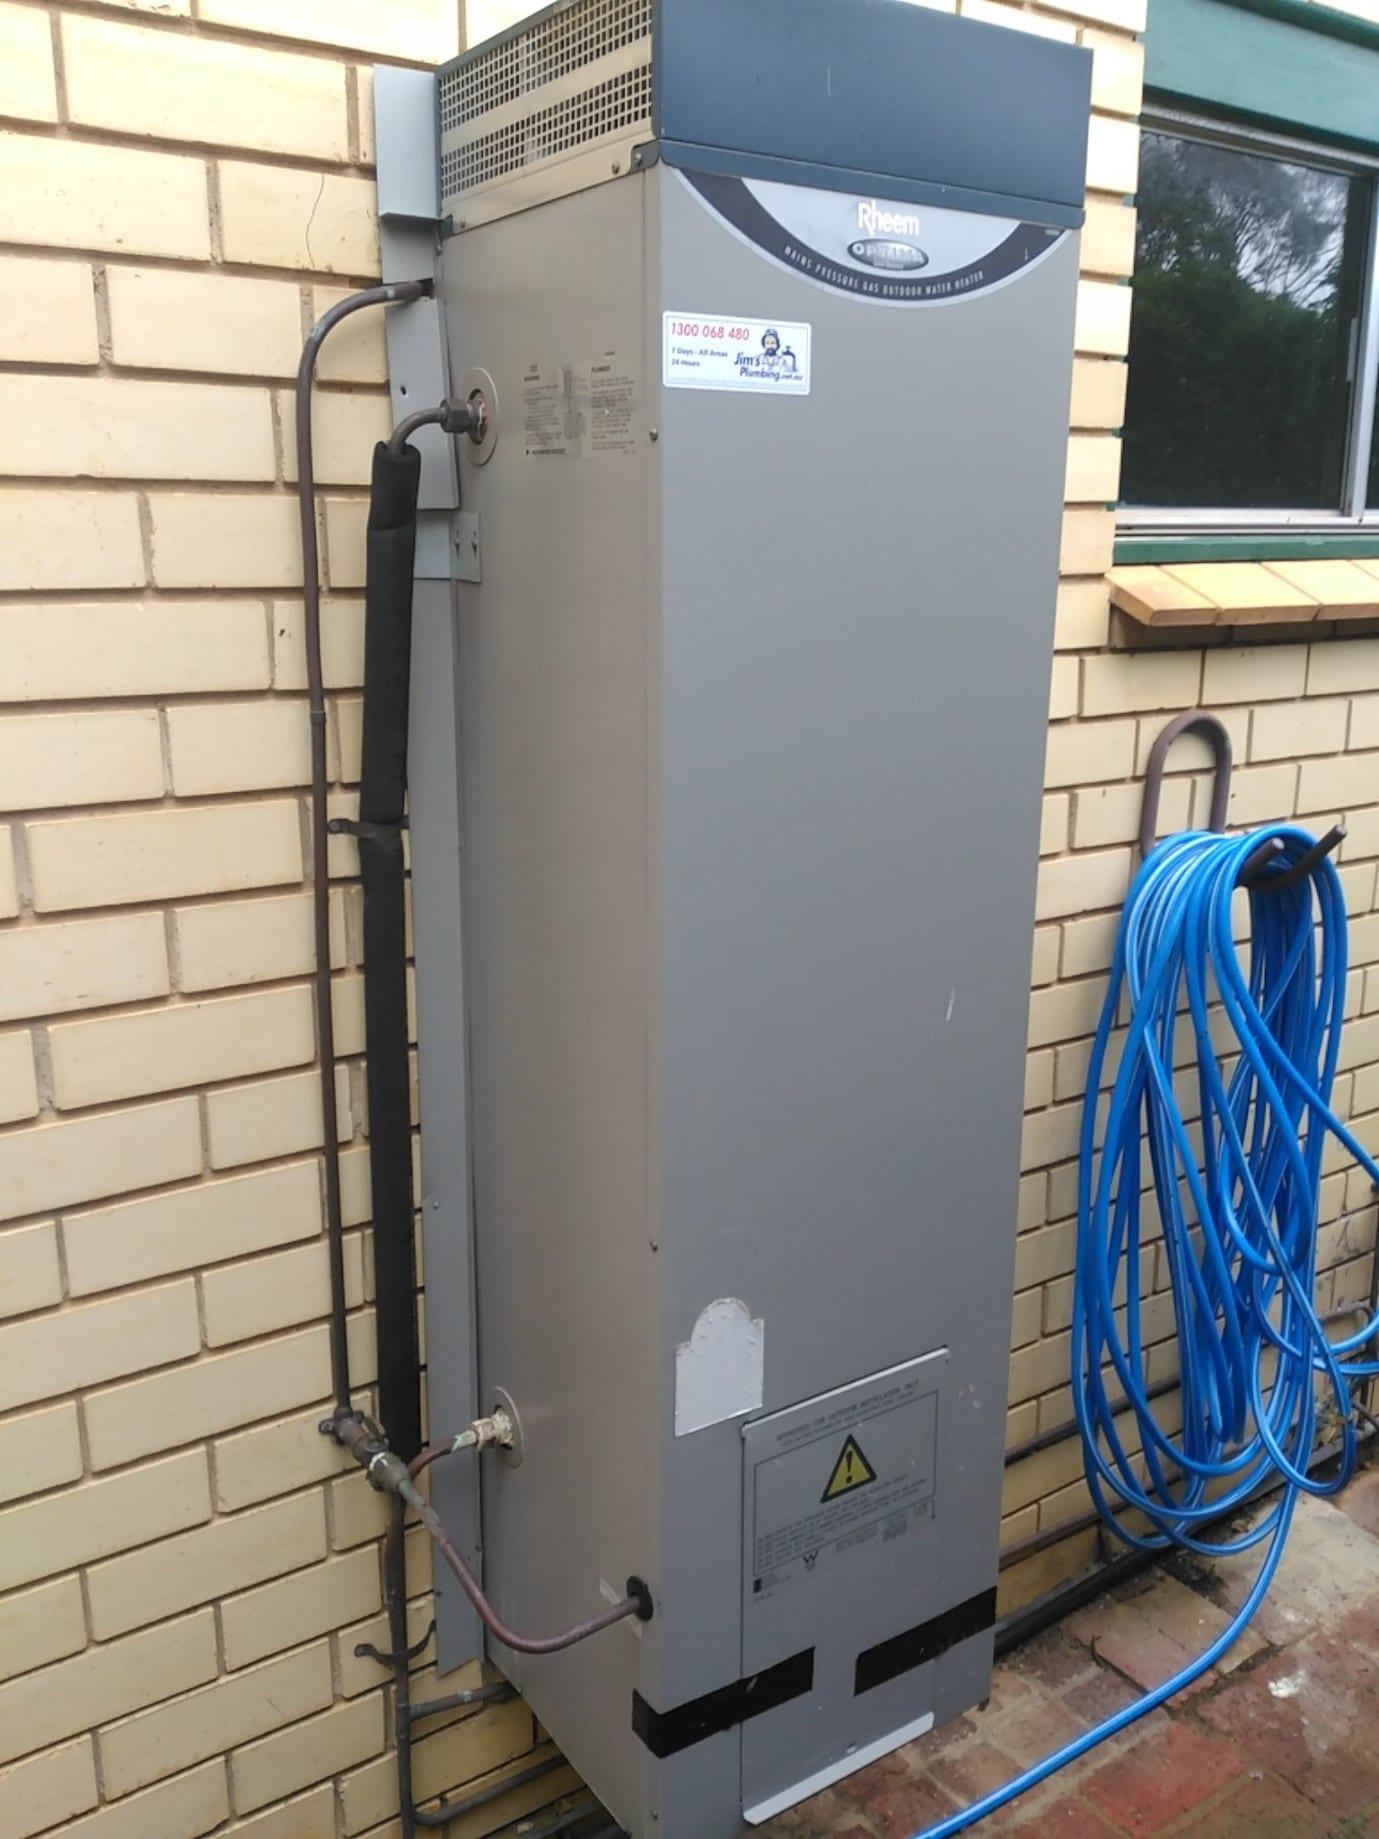 Image Result For Image Result For Rheem Water Heater Customer Service